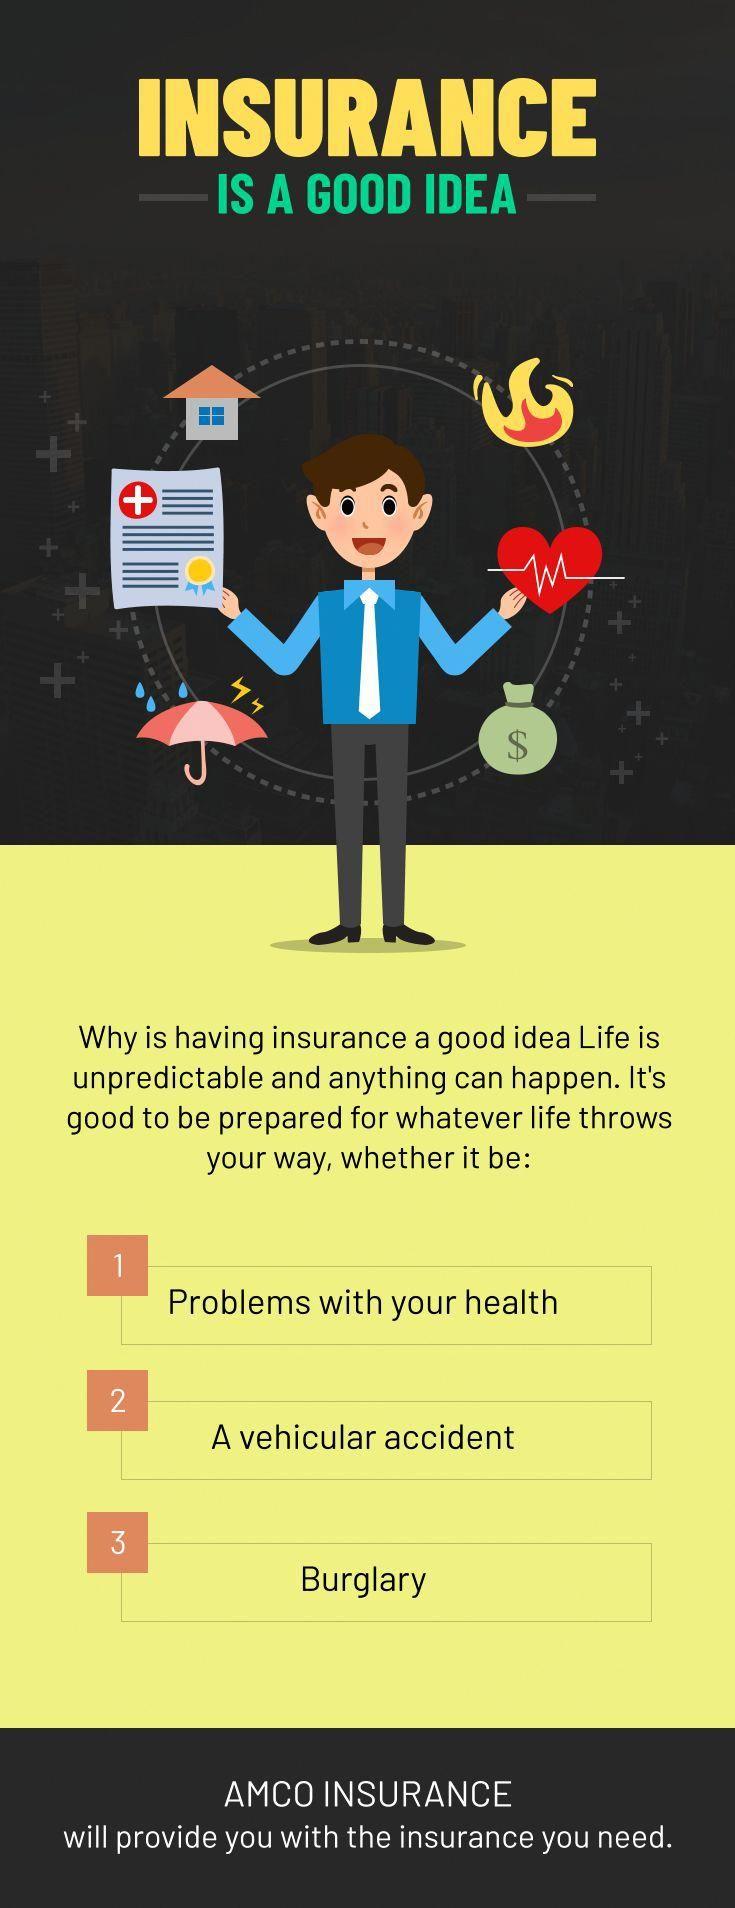 Insurance is a good idea